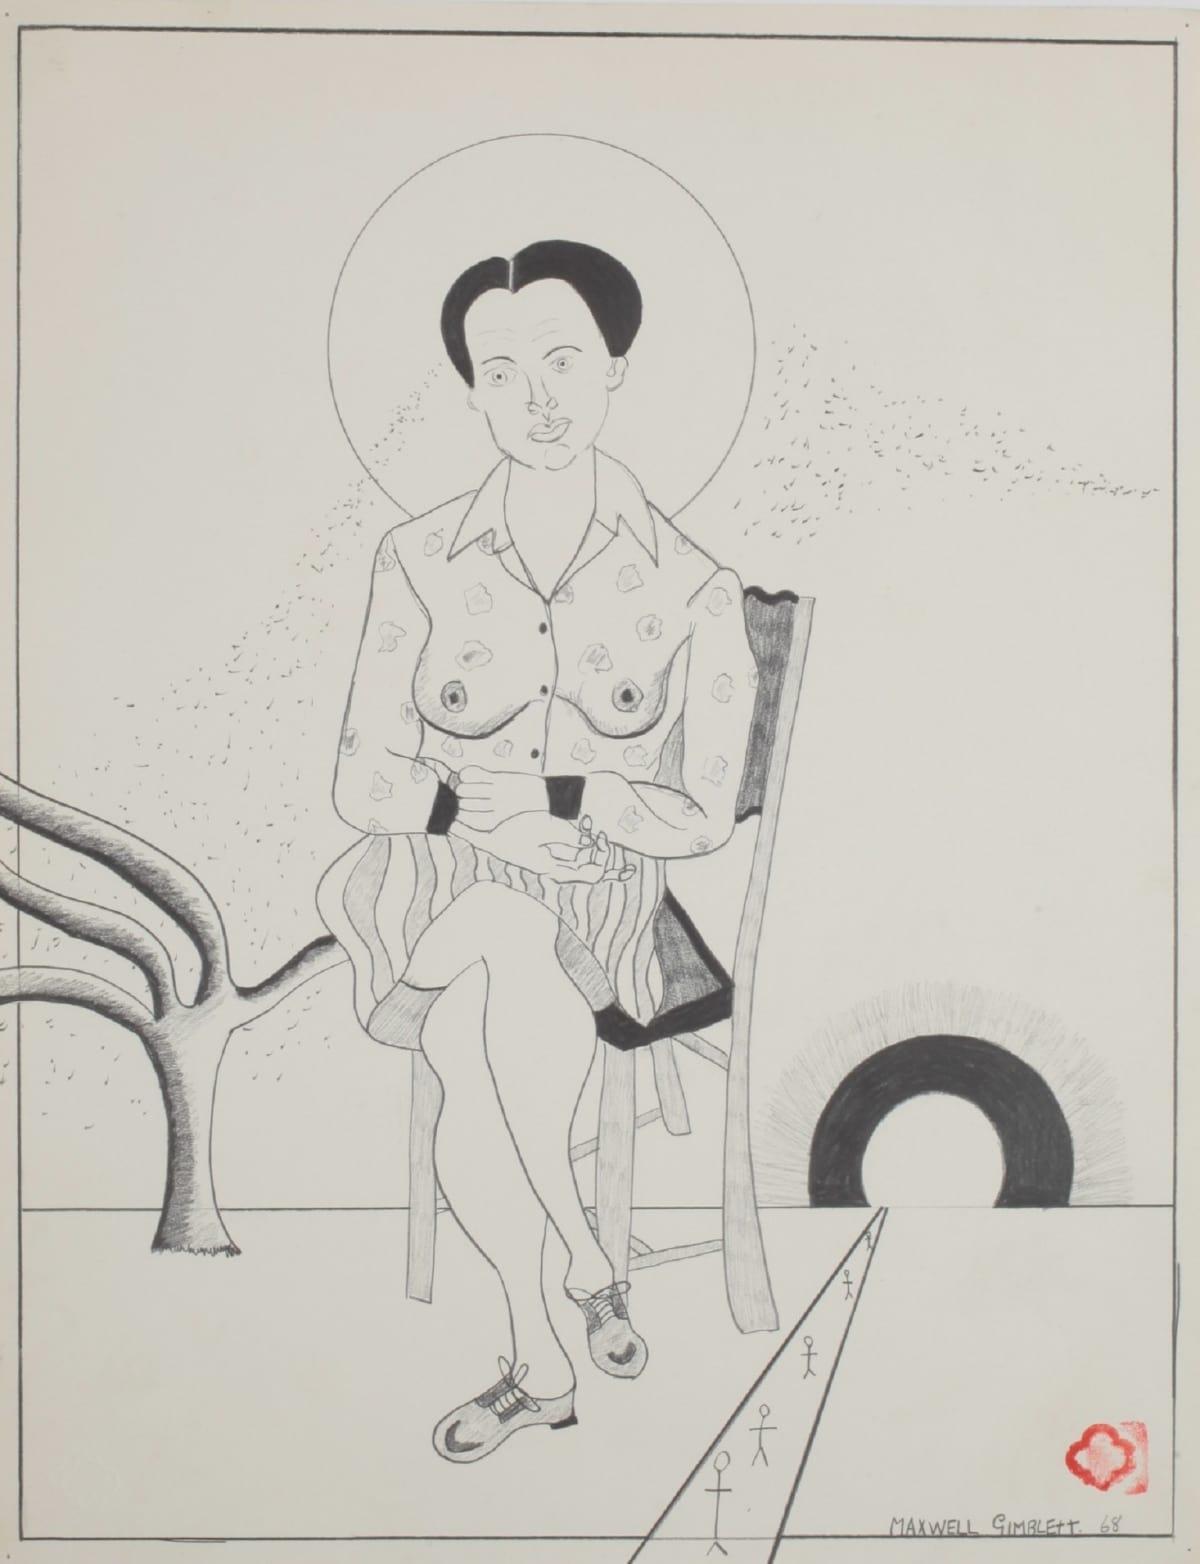 Max GIMBLETT Slouching Towards Bethlehem, 1968 Pencil on paper 18 x 14 in 45.7 x 35.6 cm